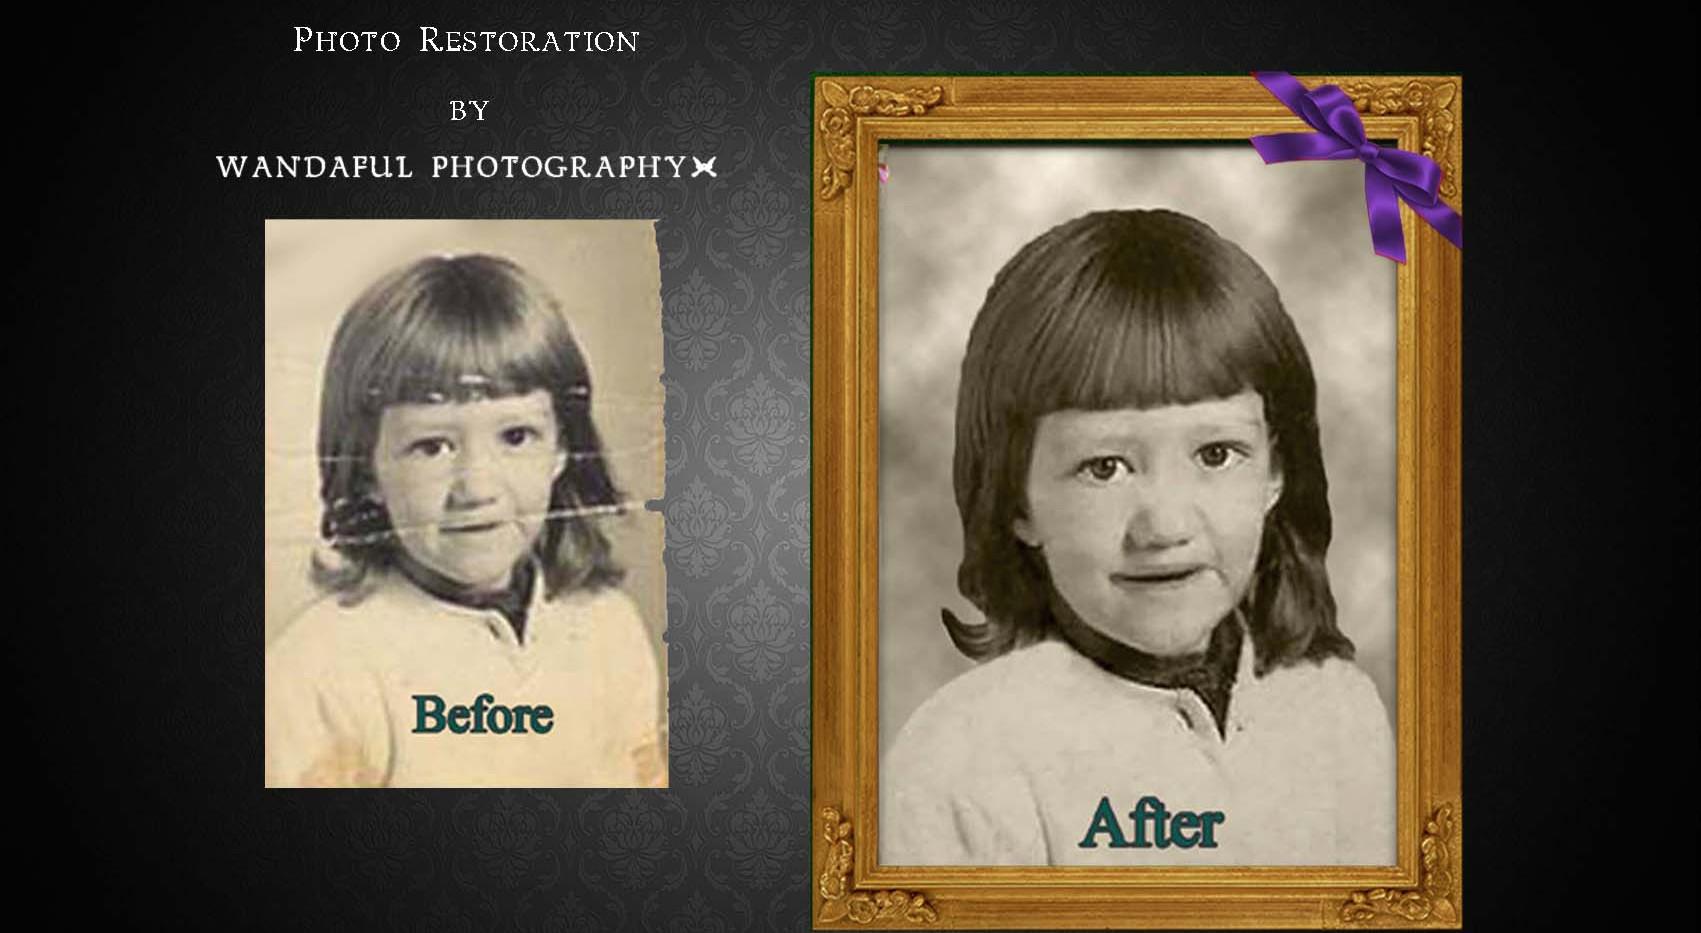 barbara photo restored.jpg